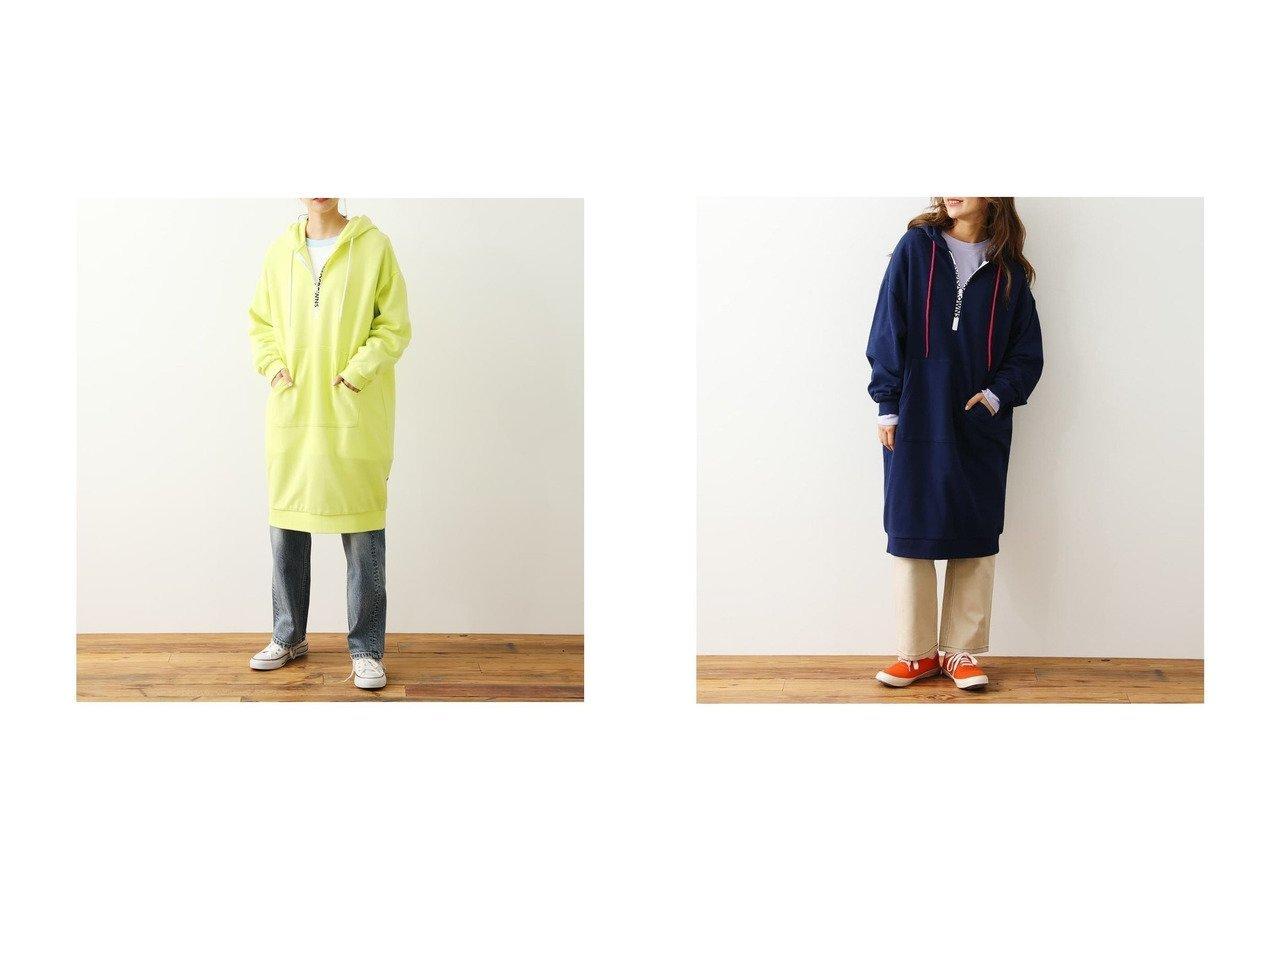 【RODEO CROWNS WIDE BOWL/ロデオクラウンズワイドボウル】のファスナーロゴフードワンピース ワンピース・ドレスのおすすめ!人気、トレンド・レディースファッションの通販 おすすめで人気の流行・トレンド、ファッションの通販商品 メンズファッション・キッズファッション・インテリア・家具・レディースファッション・服の通販 founy(ファニー) https://founy.com/ ファッション Fashion レディースファッション WOMEN ワンピース Dress 2021年 2021 2021 春夏 S/S SS Spring/Summer 2021 S/S 春夏 SS Spring/Summer プリント 春 Spring  ID:crp329100000015485